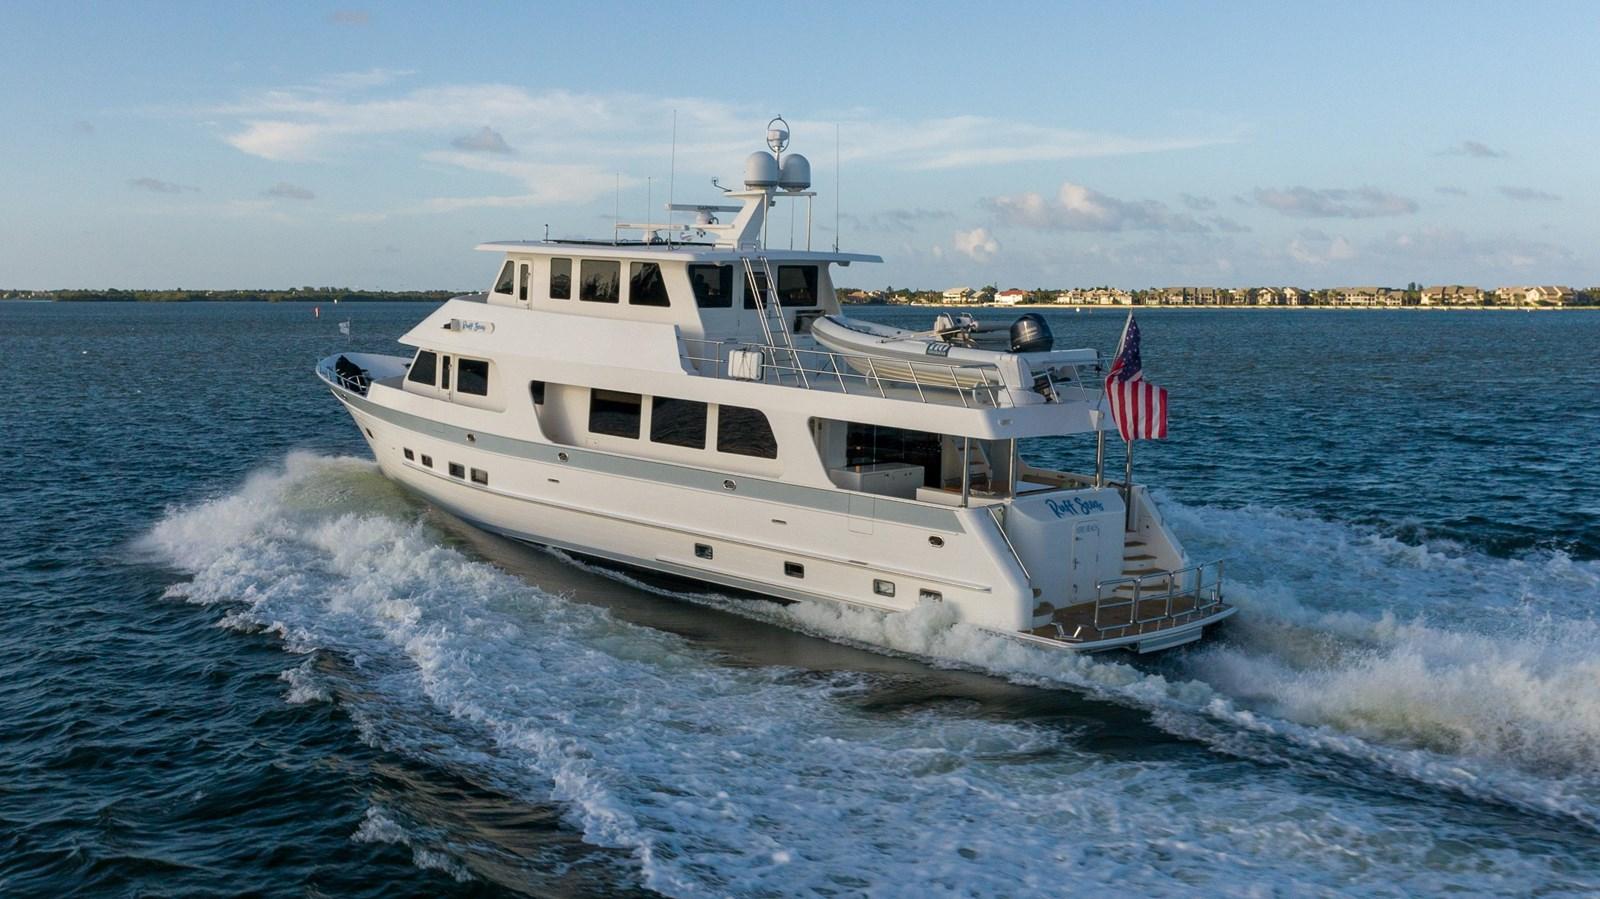 Ruff Seas yacht for sale